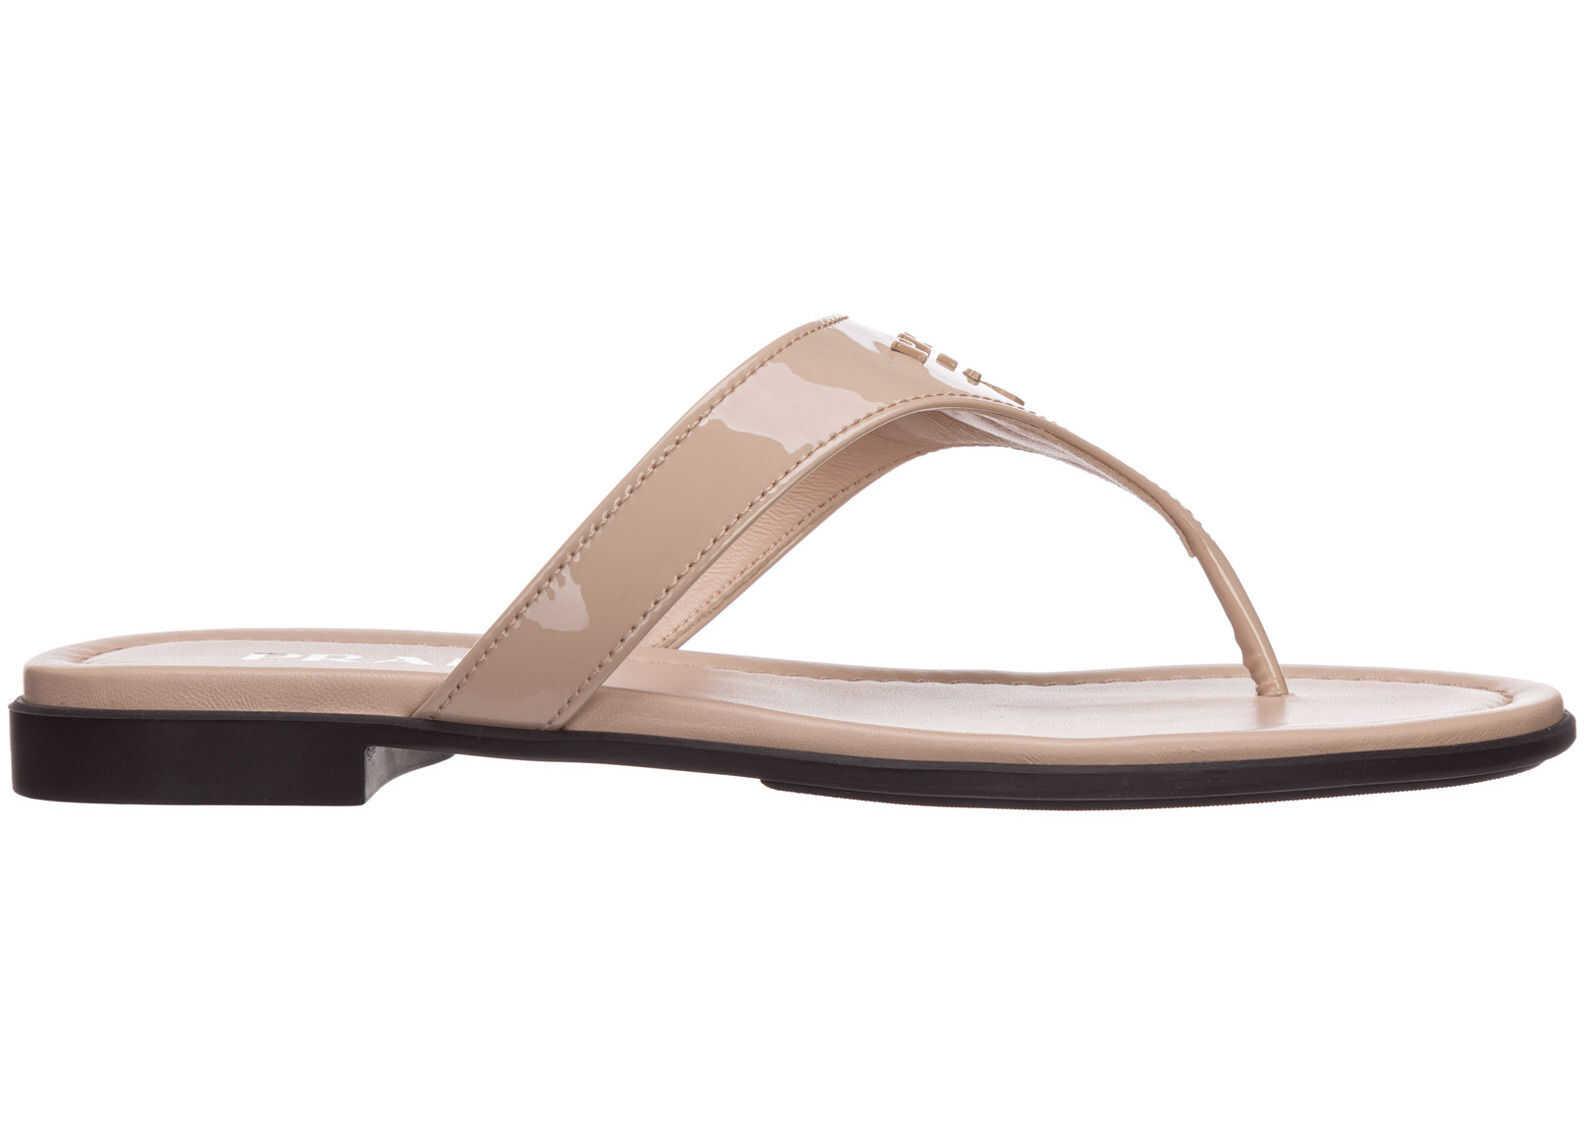 Prada Flops Sandals Pink